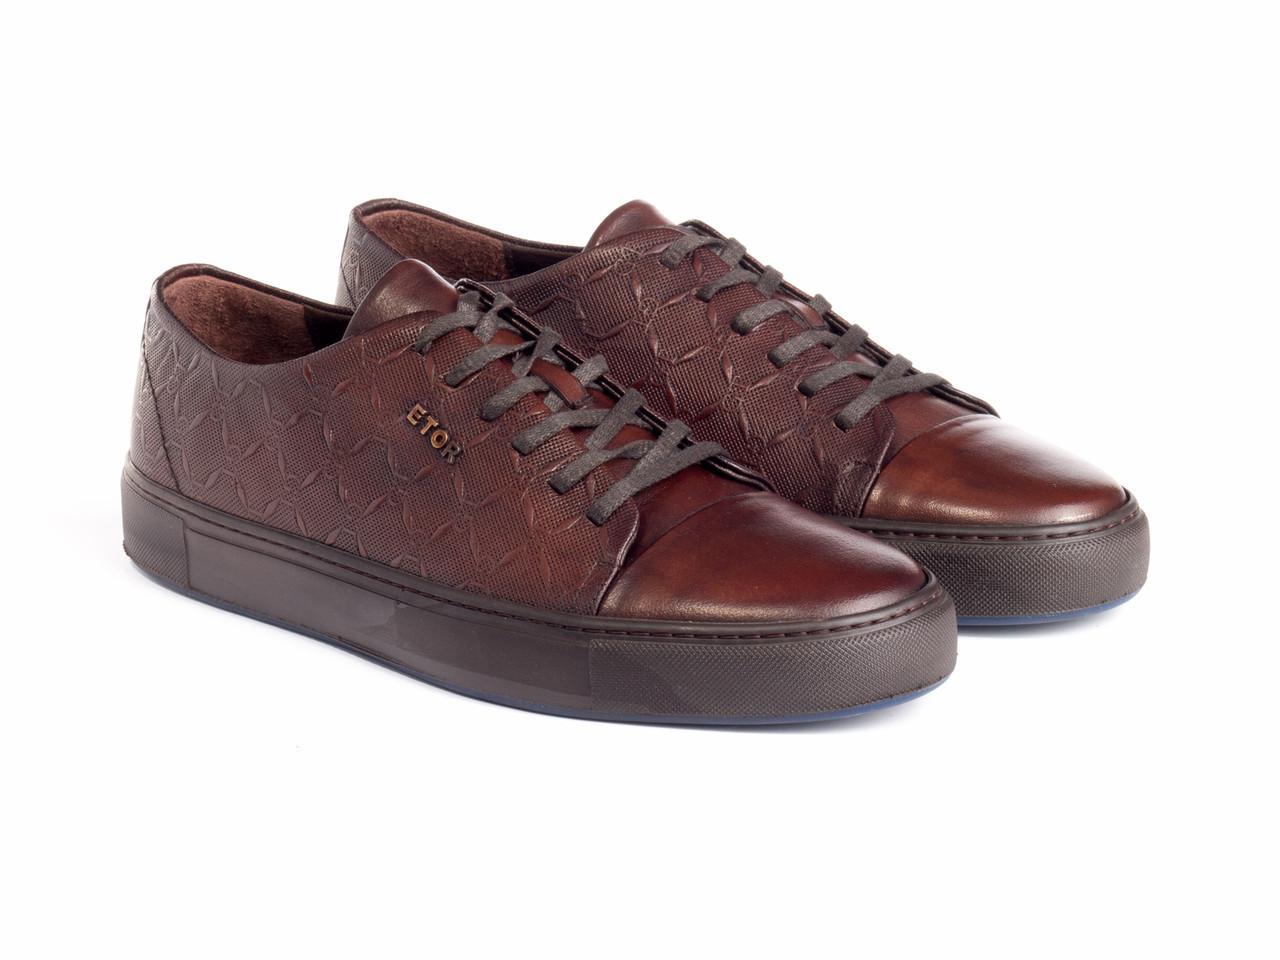 Кеды Etor 8736-78-1 40 коричневые